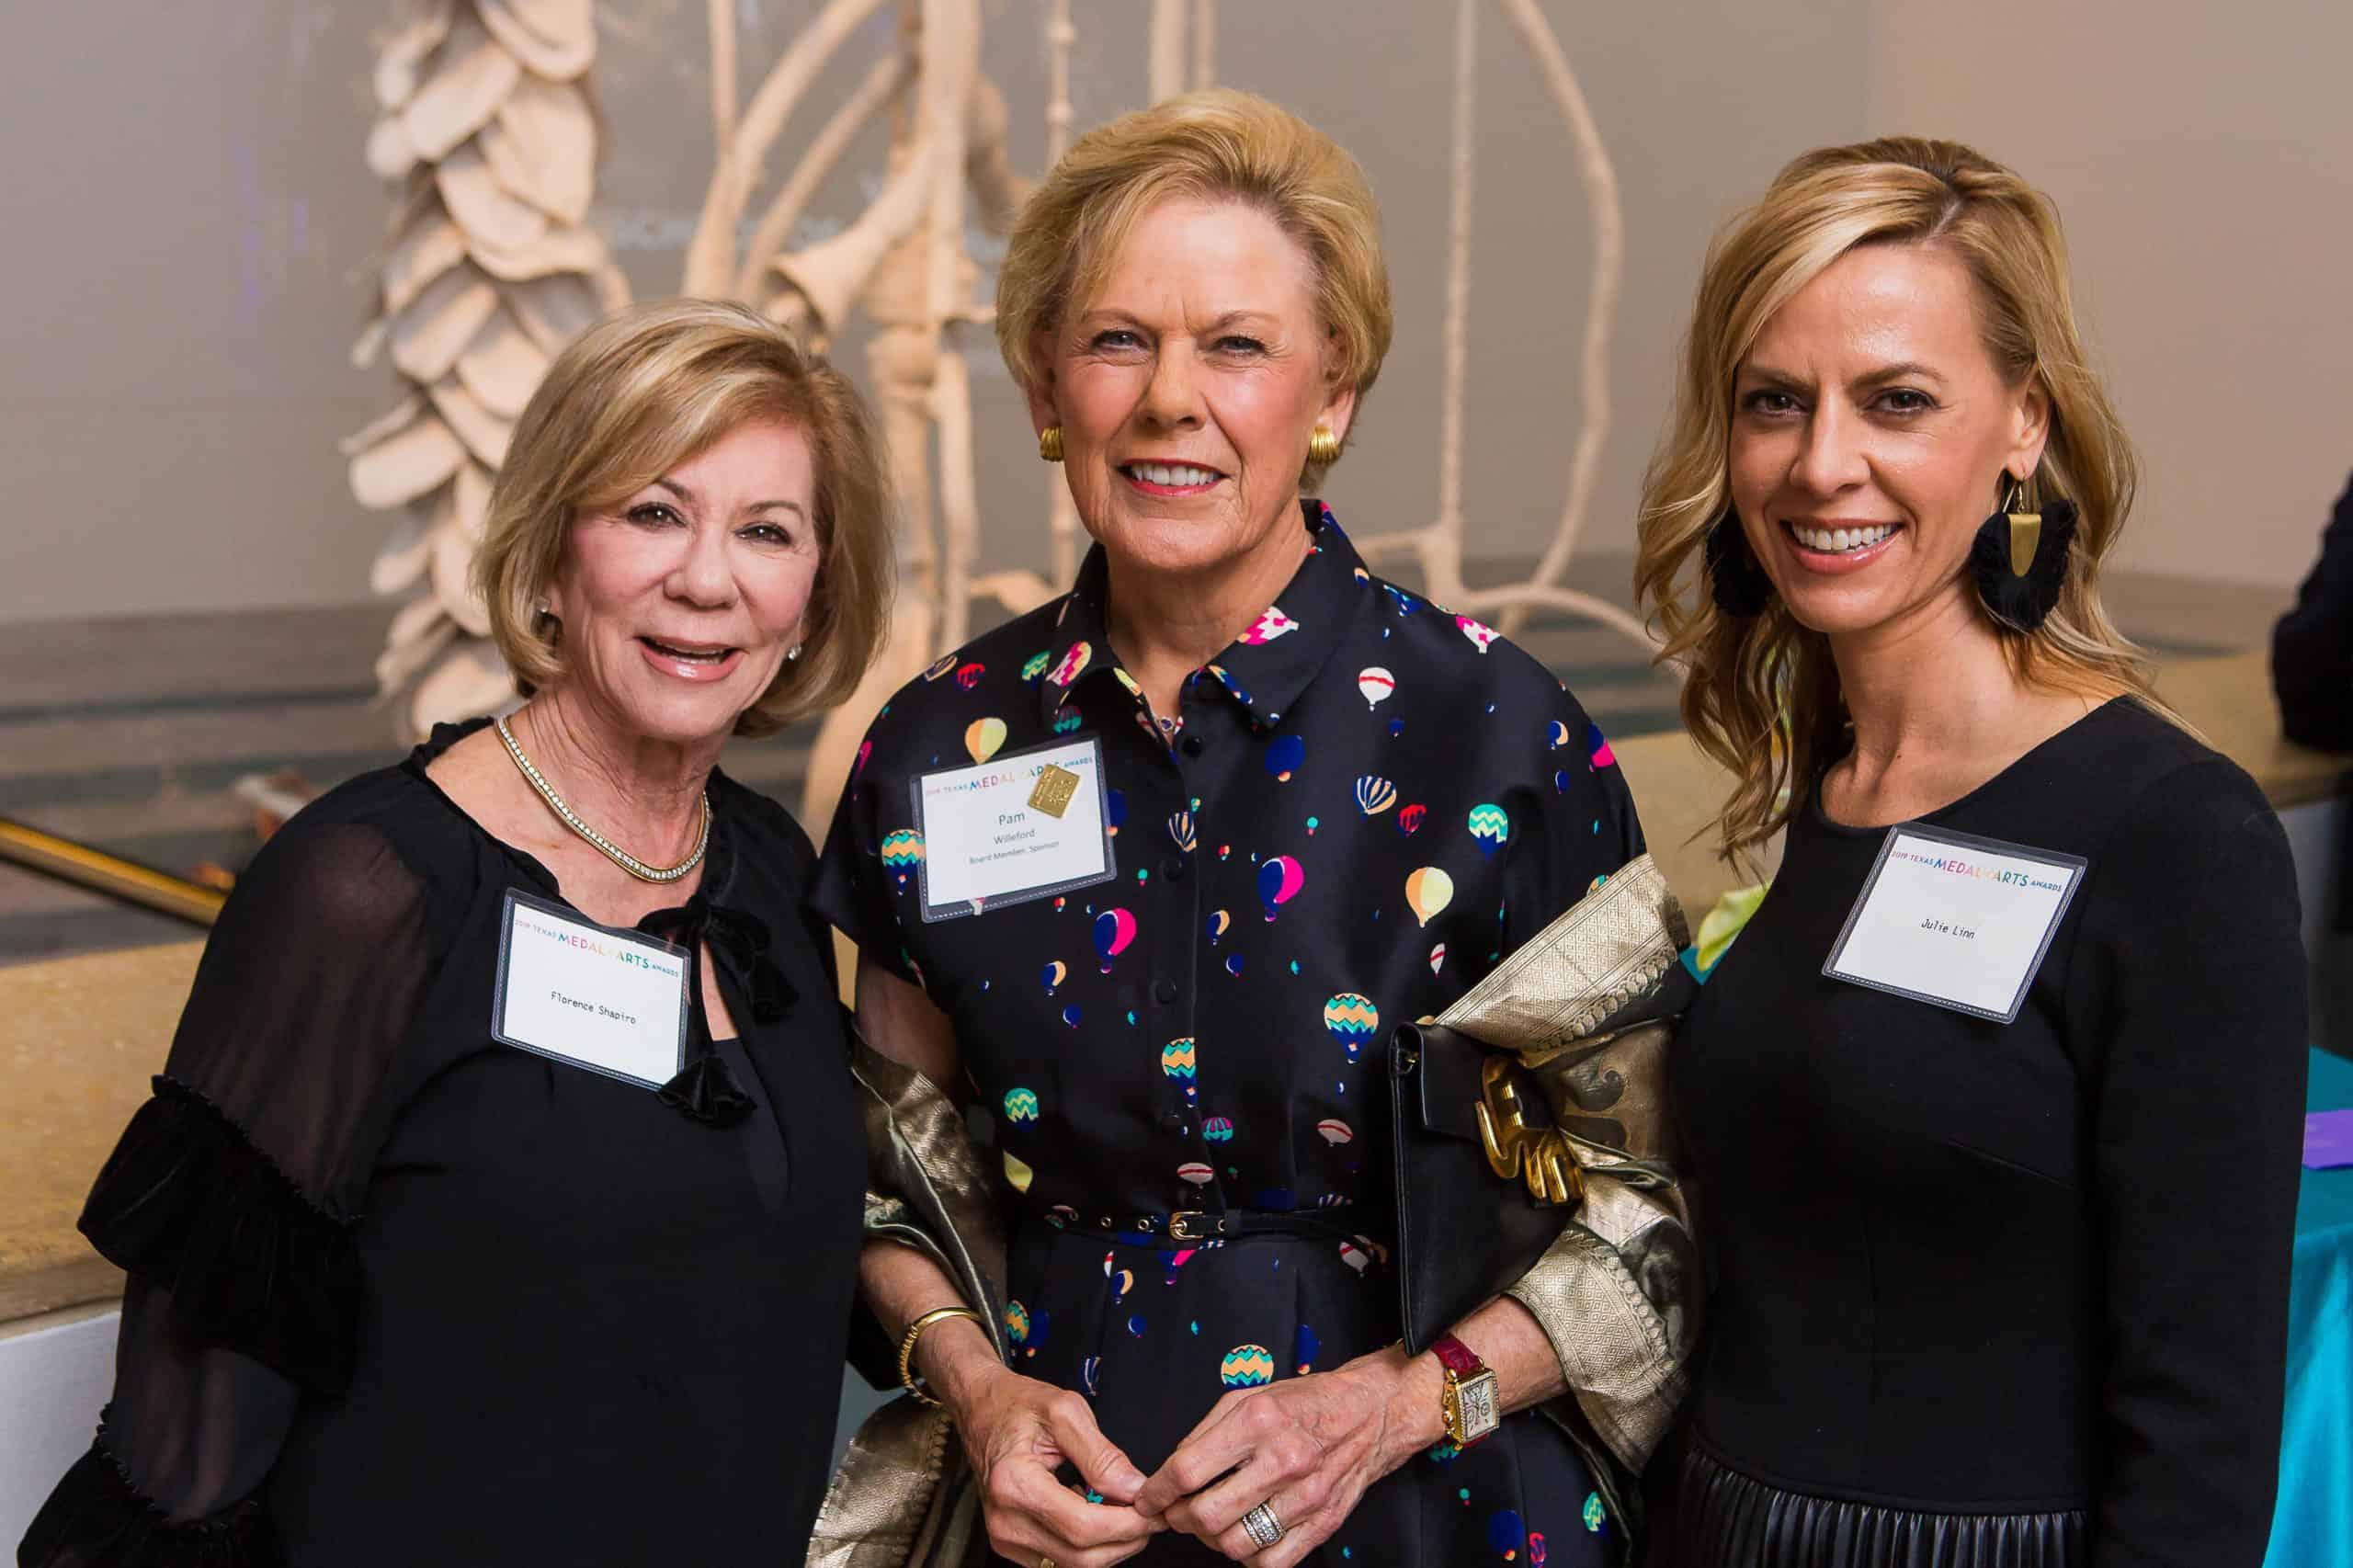 Florence Shapiro, Pam Willeford and Julie Linn